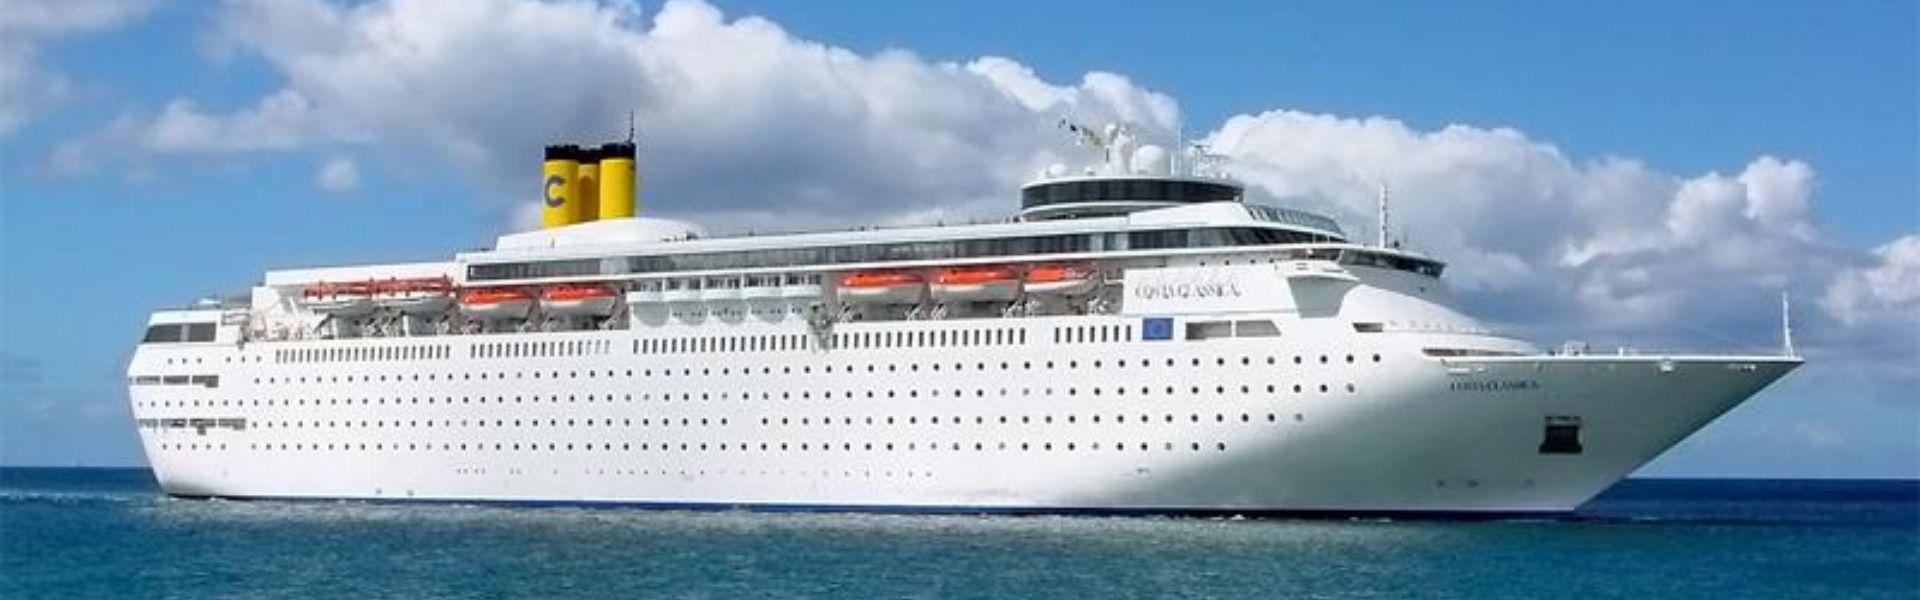 Croaziera 2017 - Oceanul Indian (Bombay) - Costa Cruises - Costa neoClasica - 7 nopti